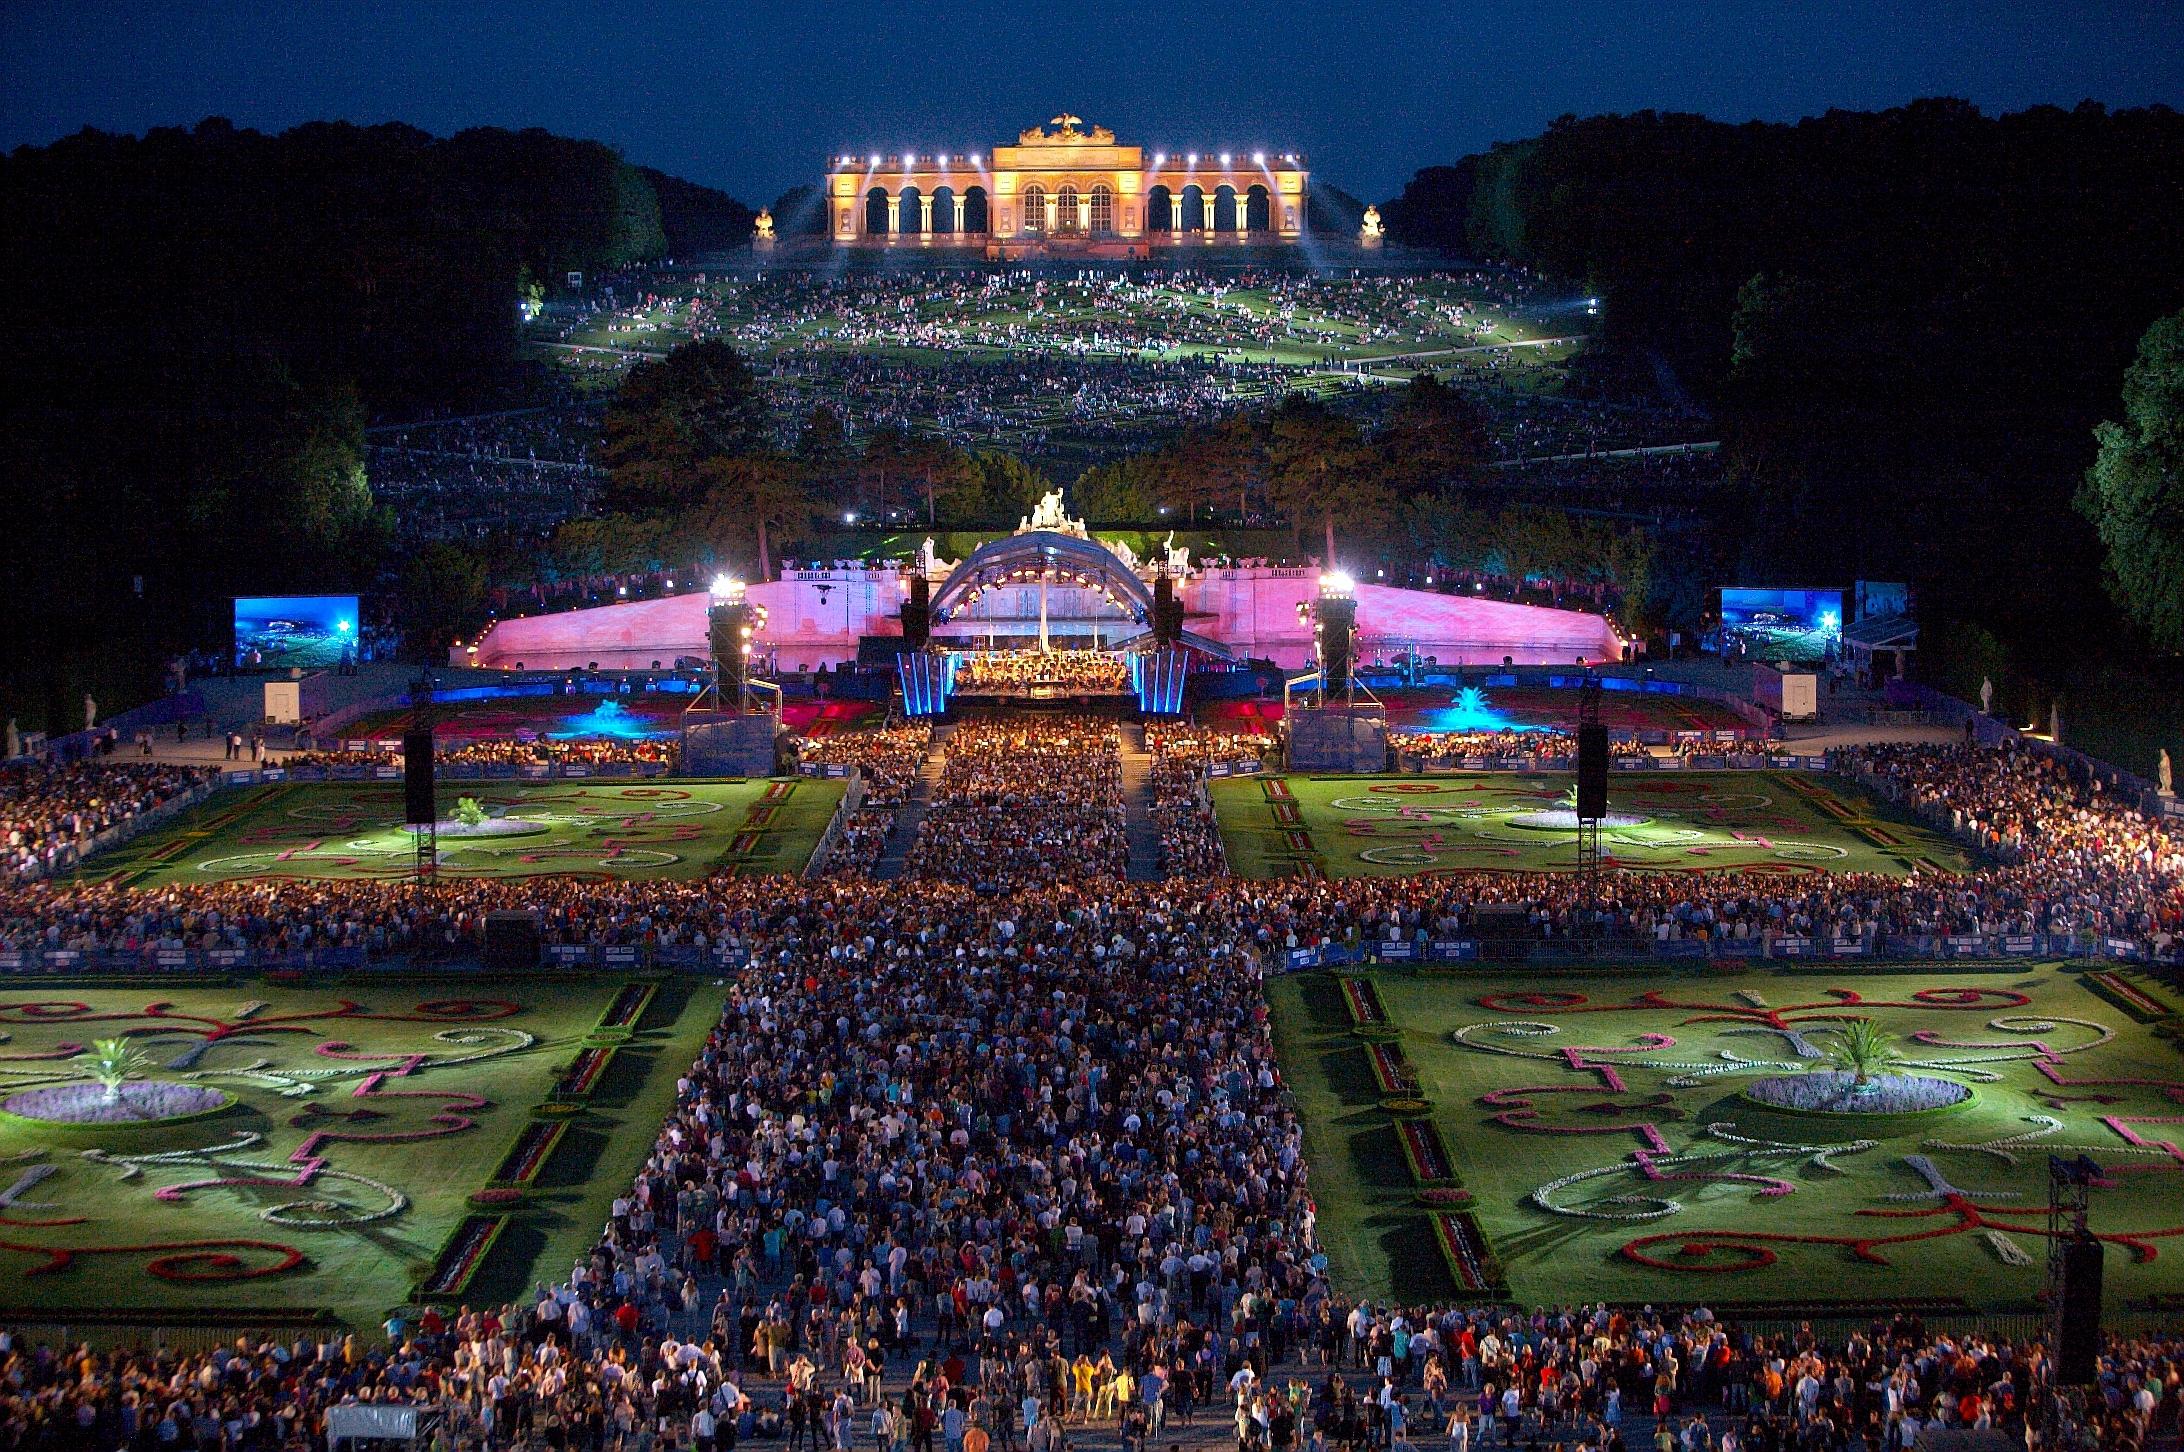 Sommernachtskonzert der Wiener Philharmoniker